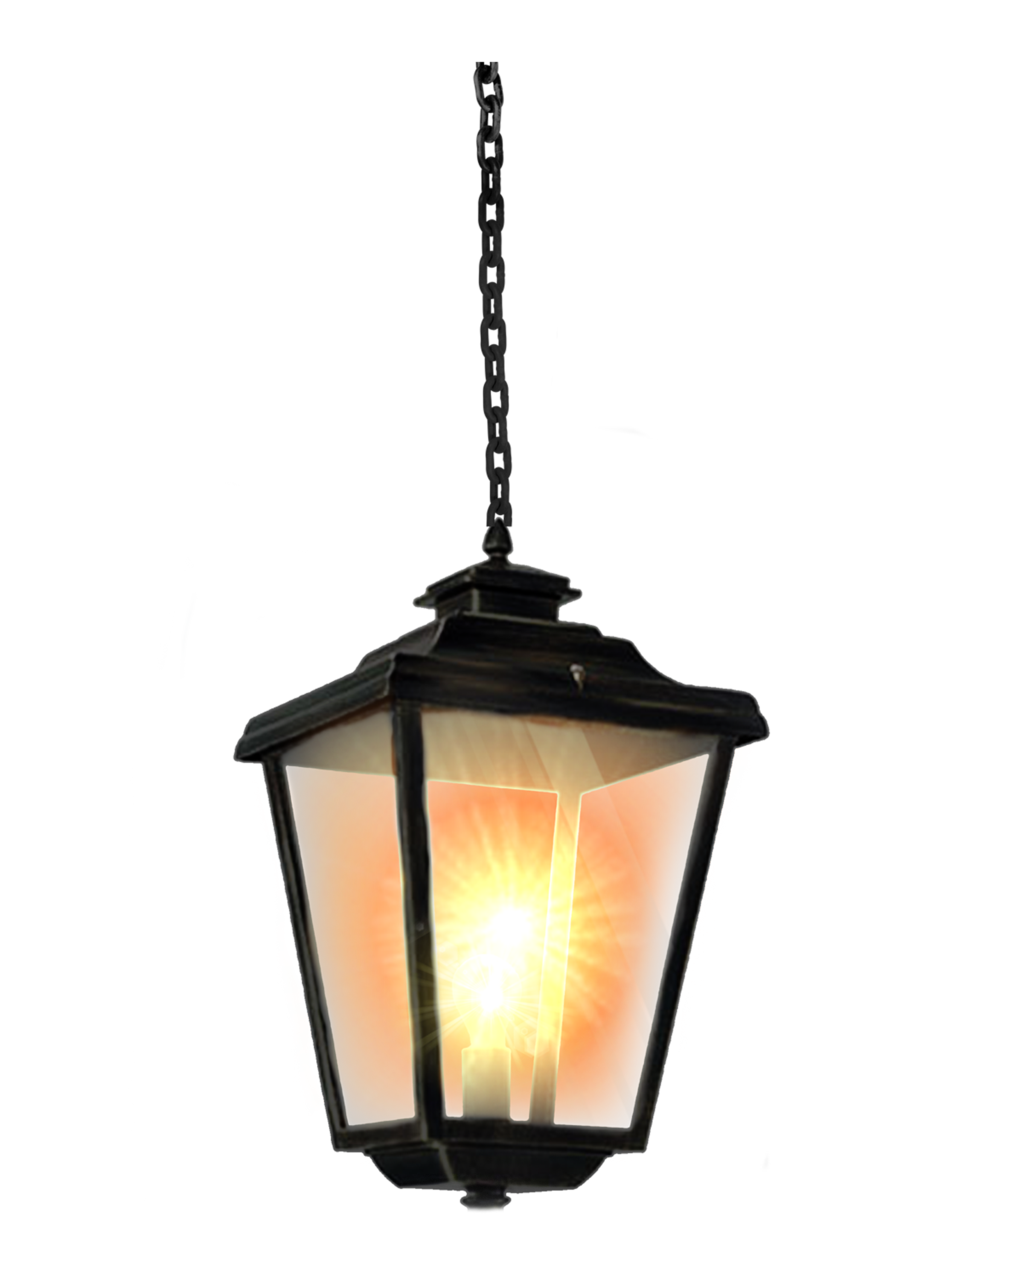 Download PNG Image   Lamp Png Image 569